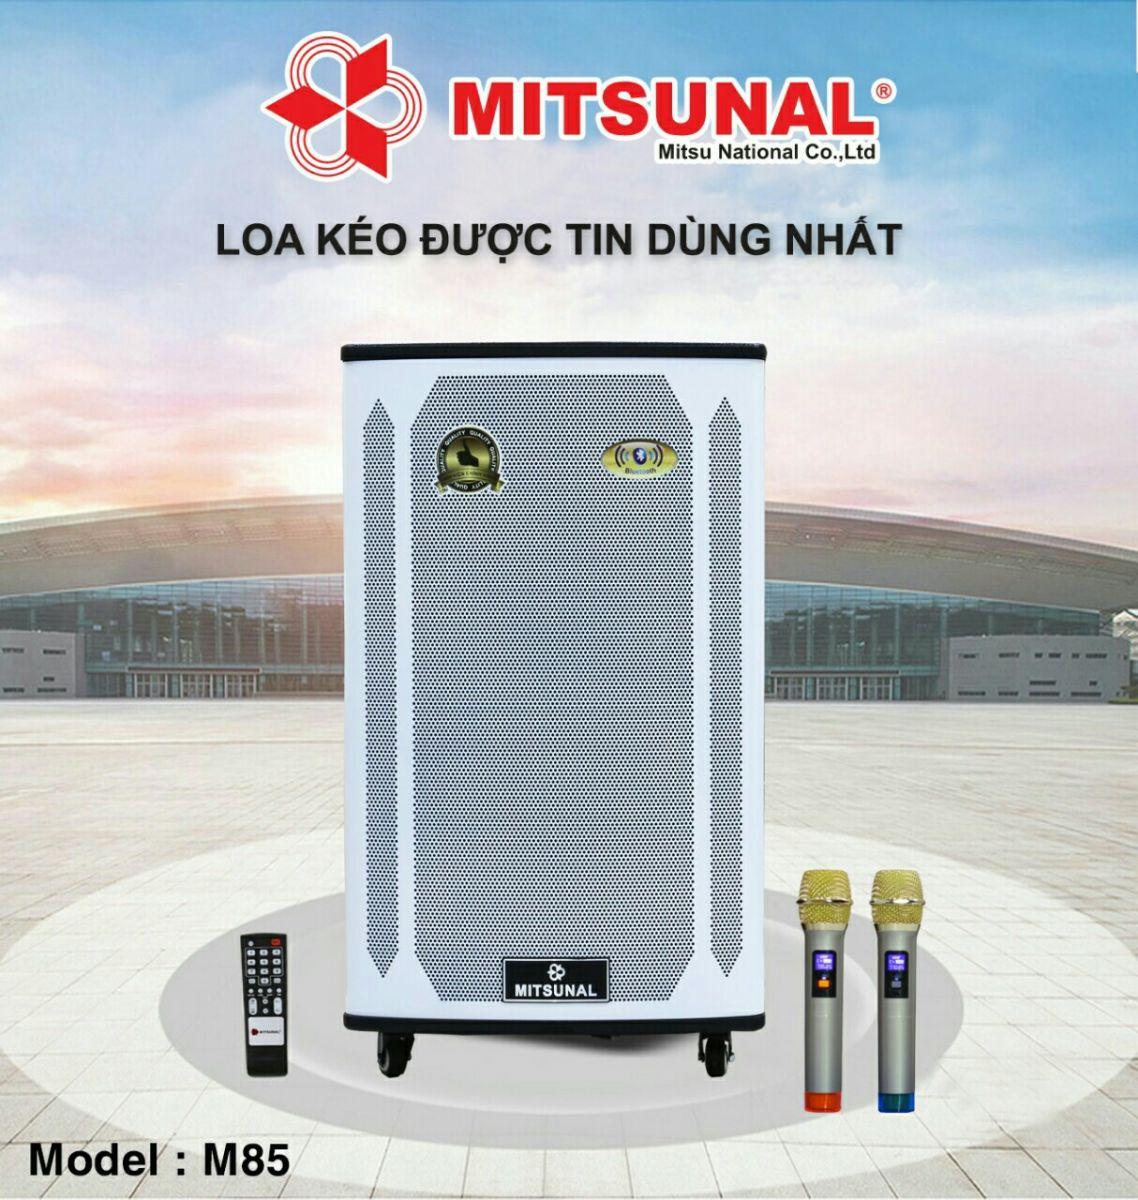 MITSUNAL M85